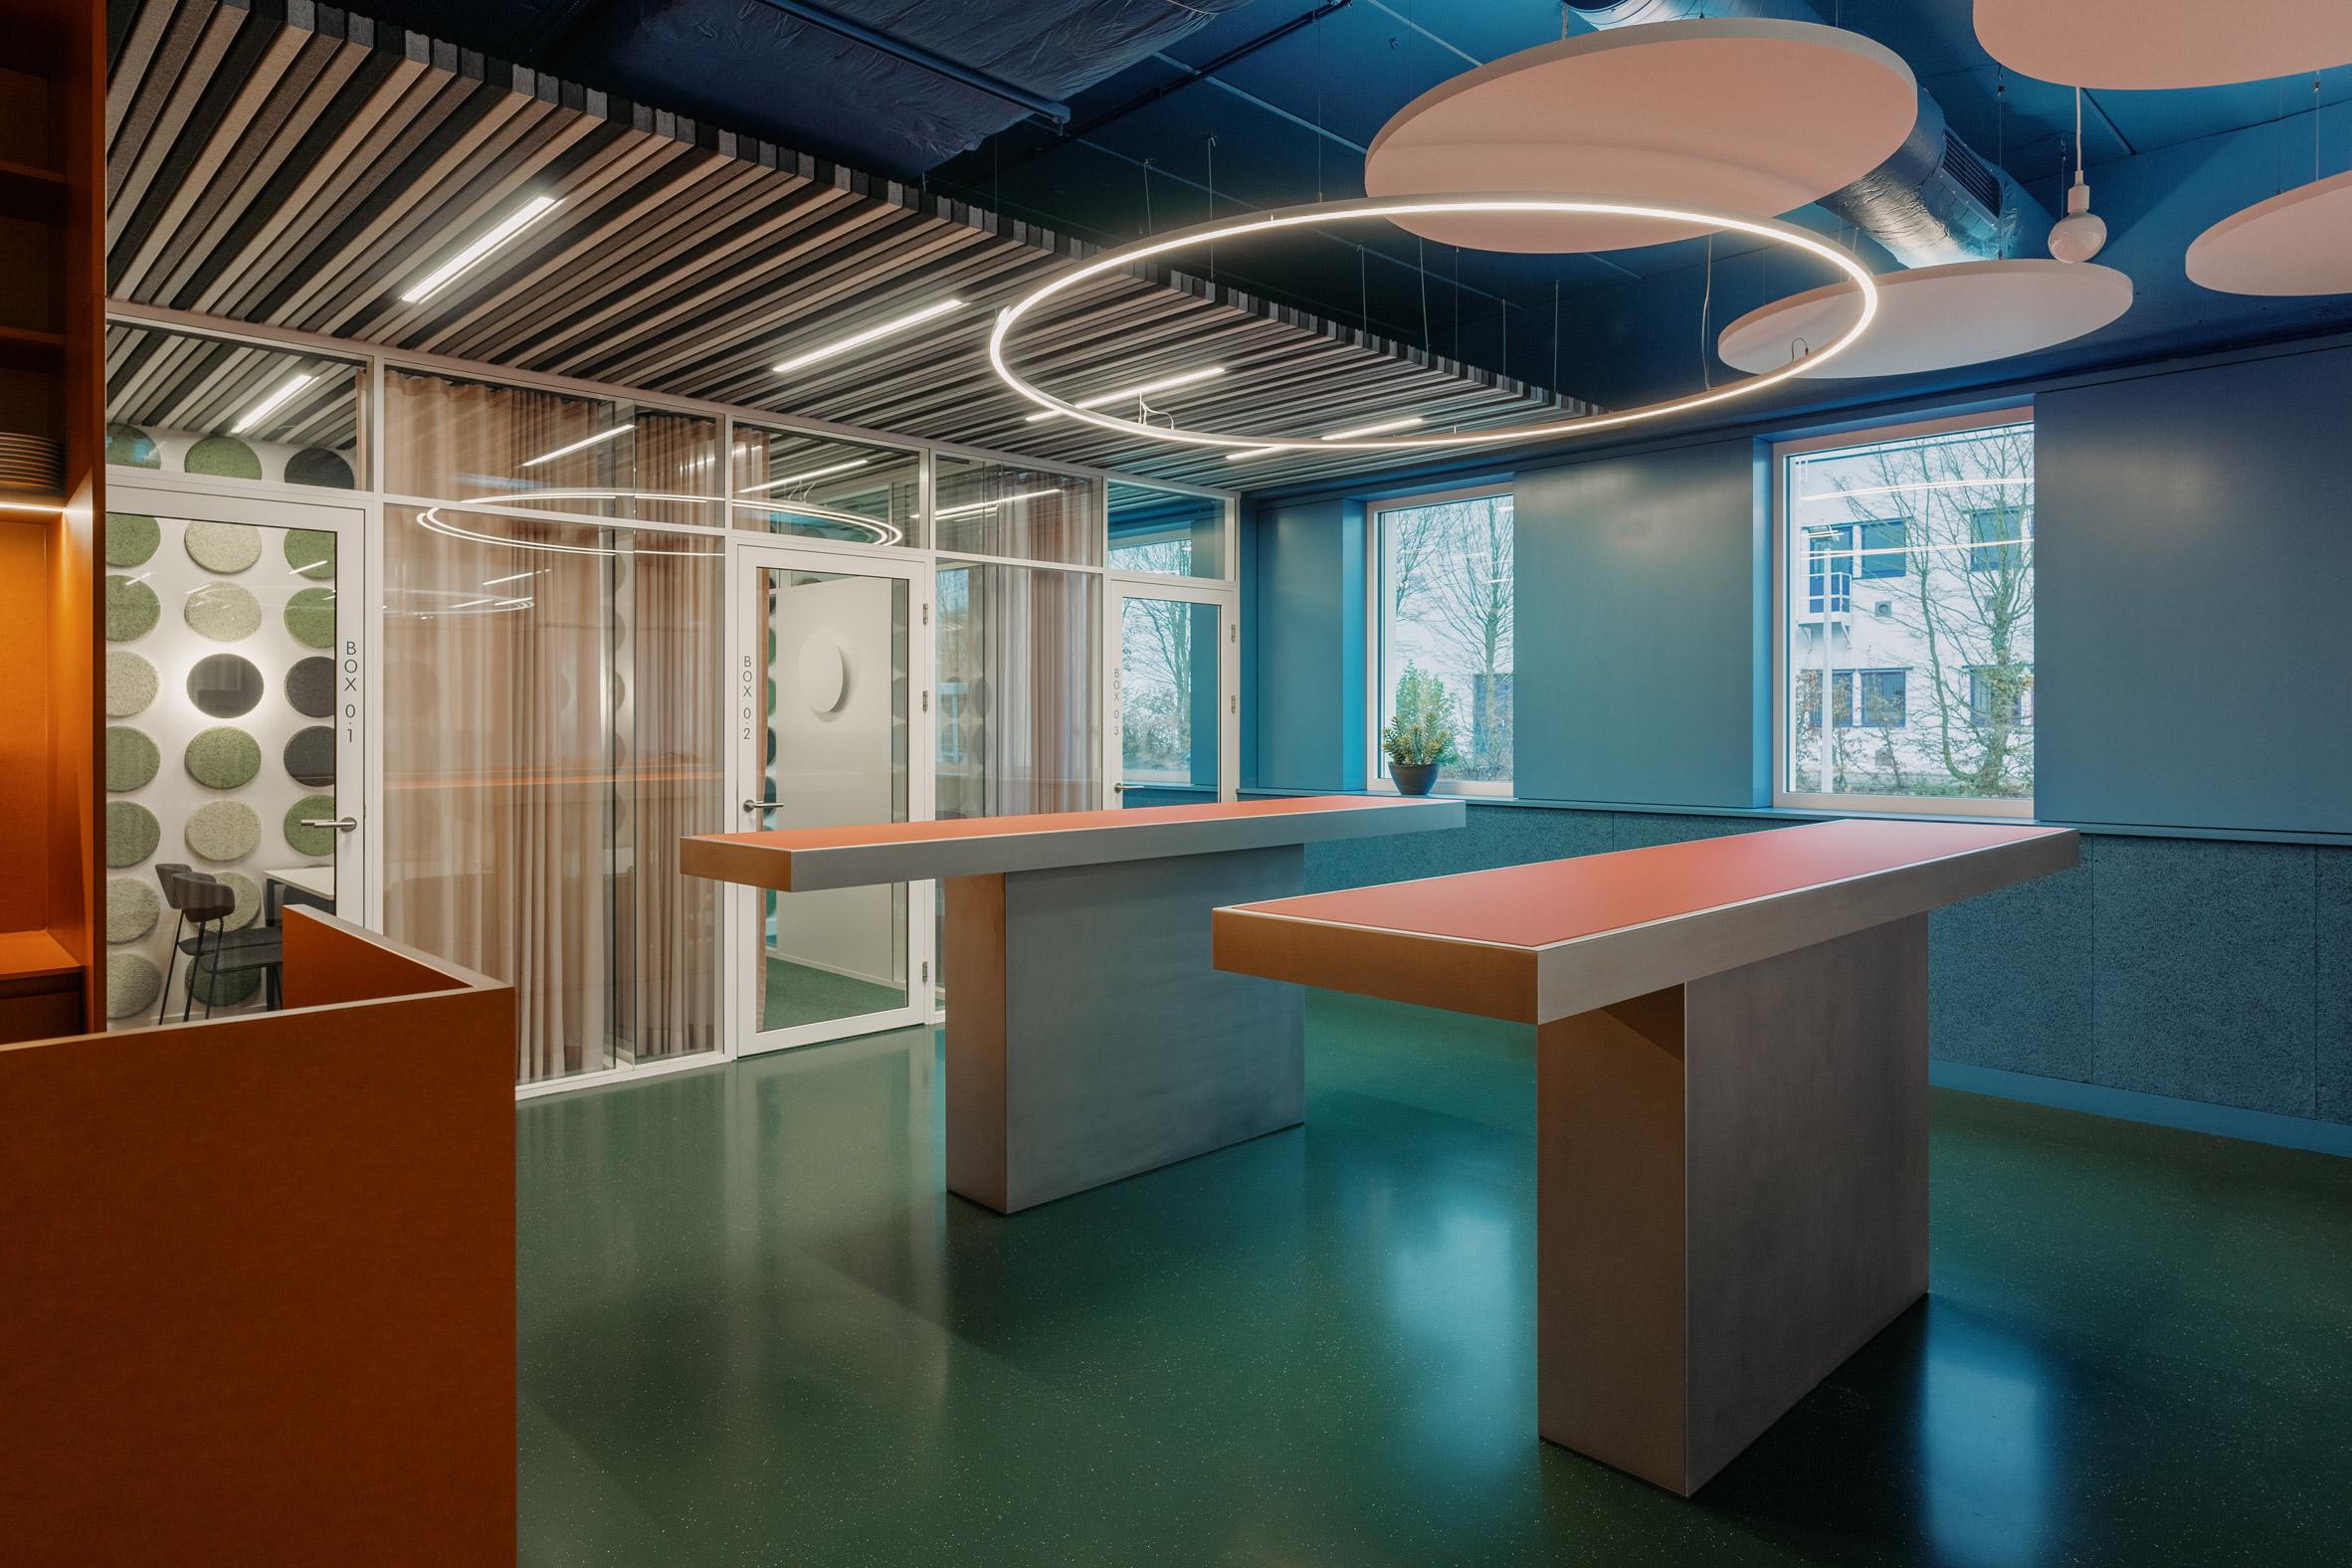 Halo lighting mimics the shape of the acoustic panels